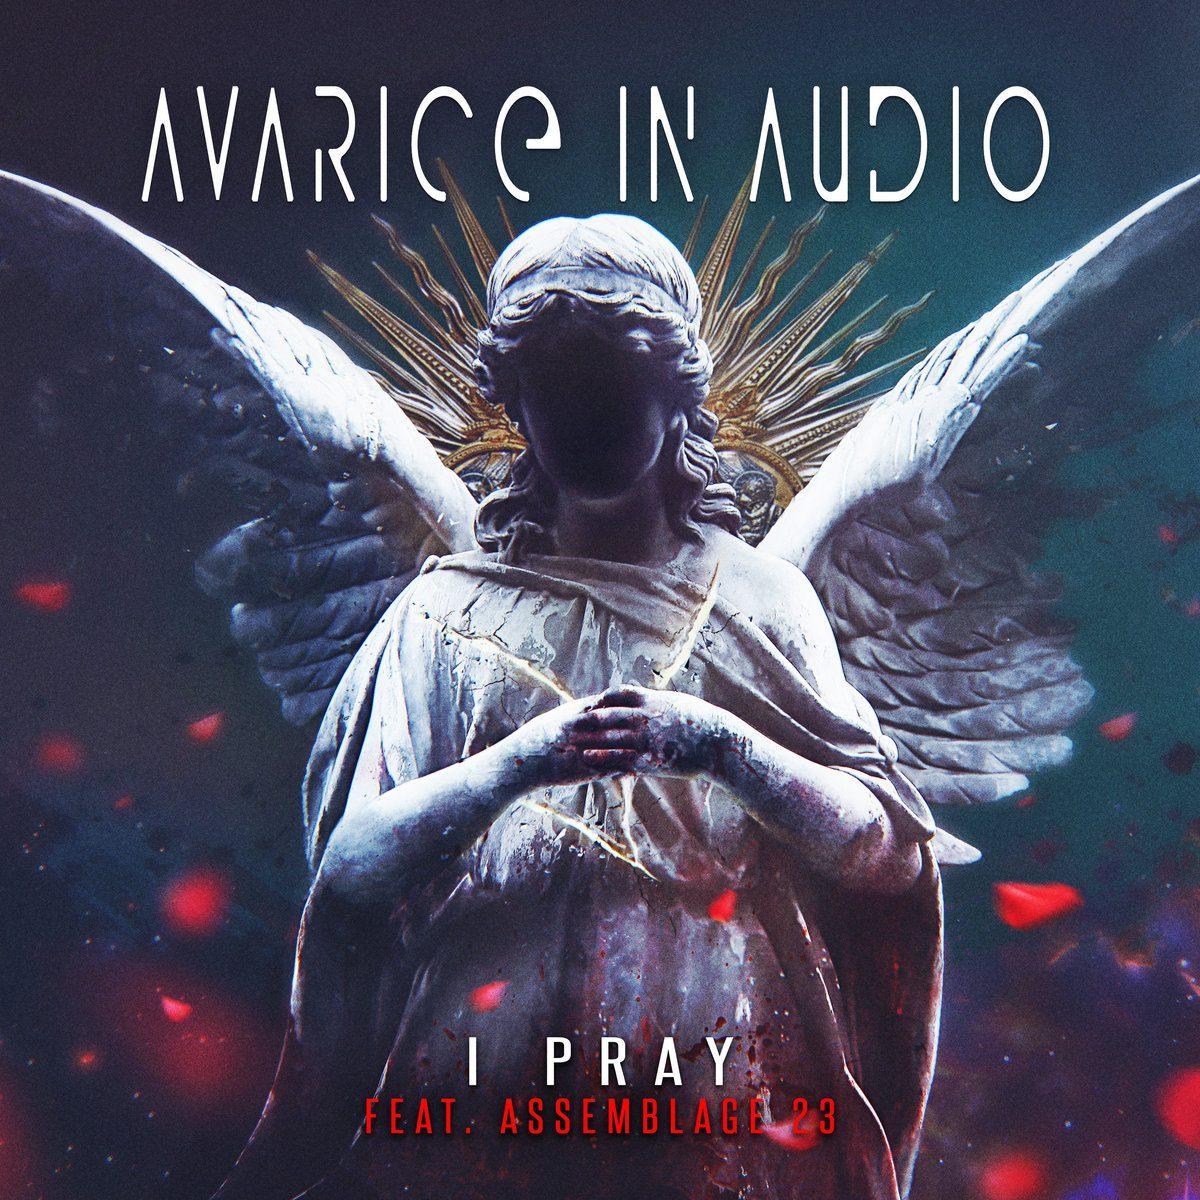 Assemblage 23's Tom Shear invited on new Avarice In Audio EP 'I Pray'